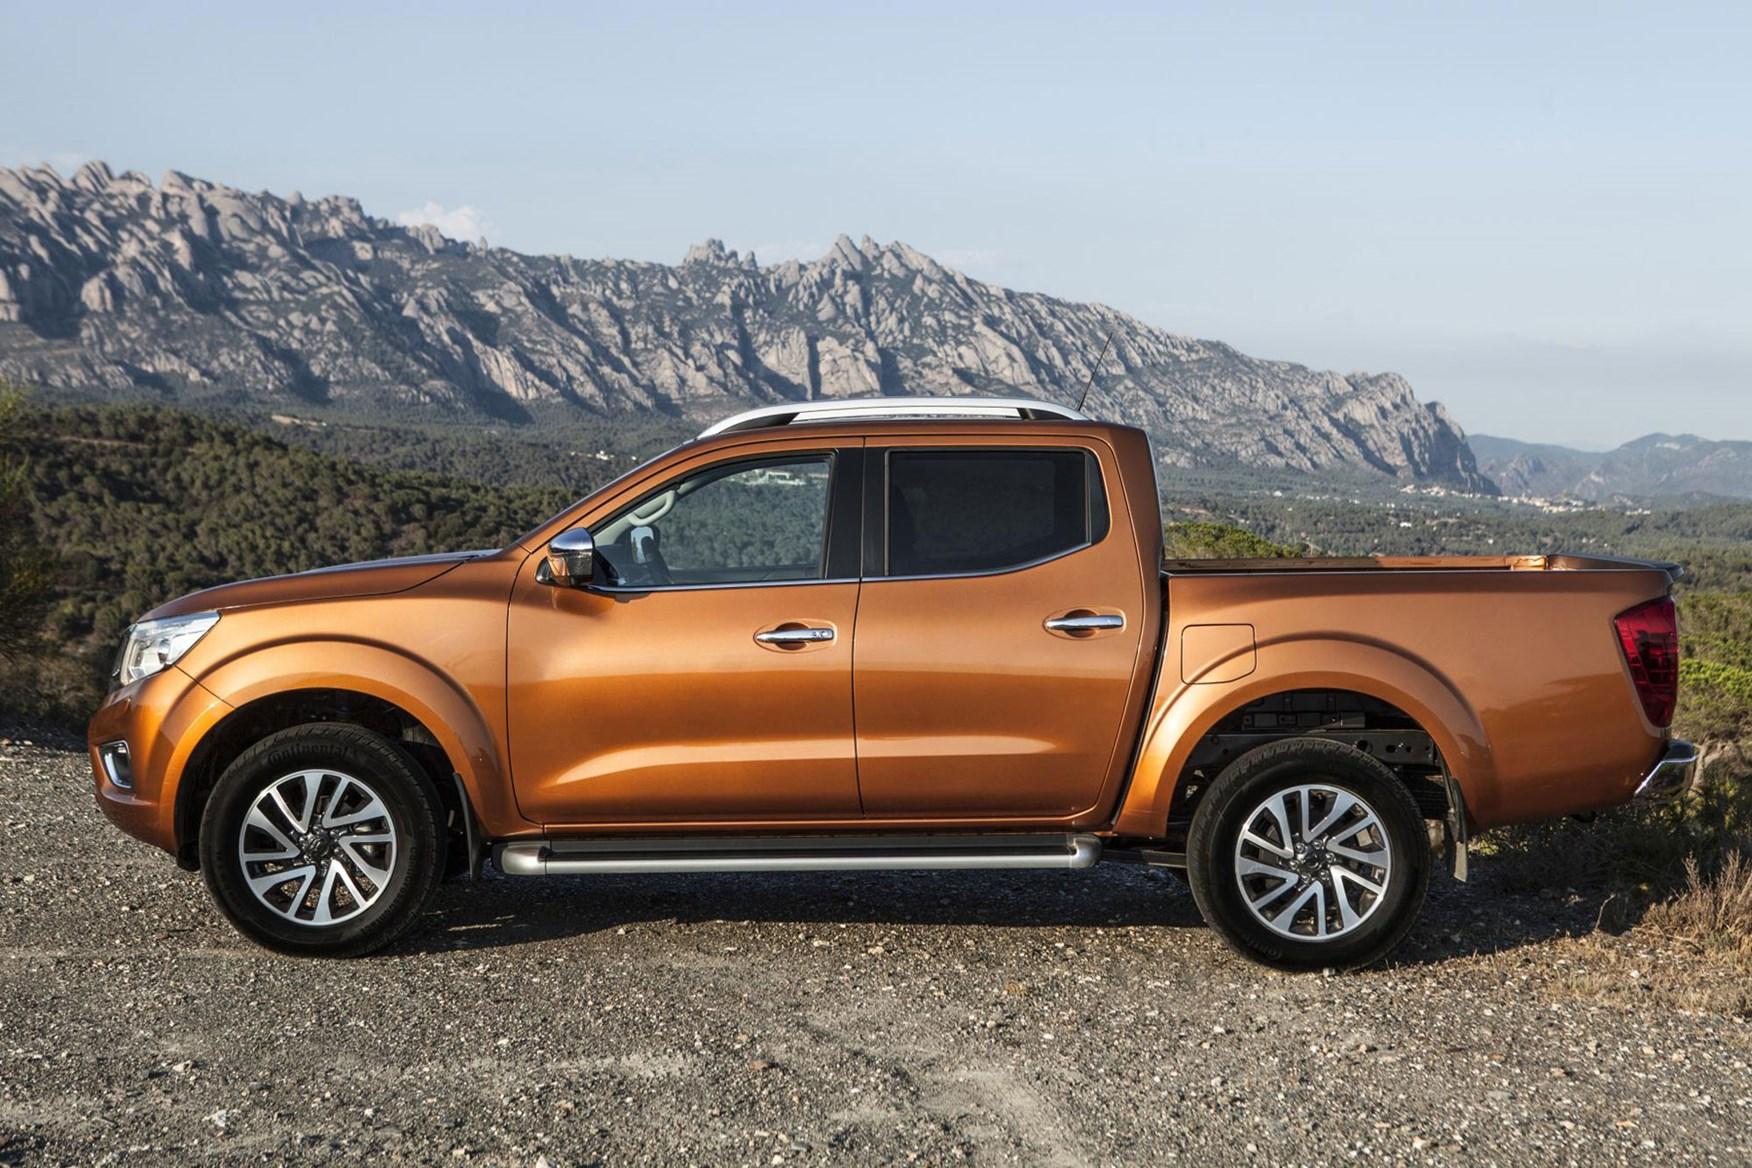 Nissan Navara review - side view, orange